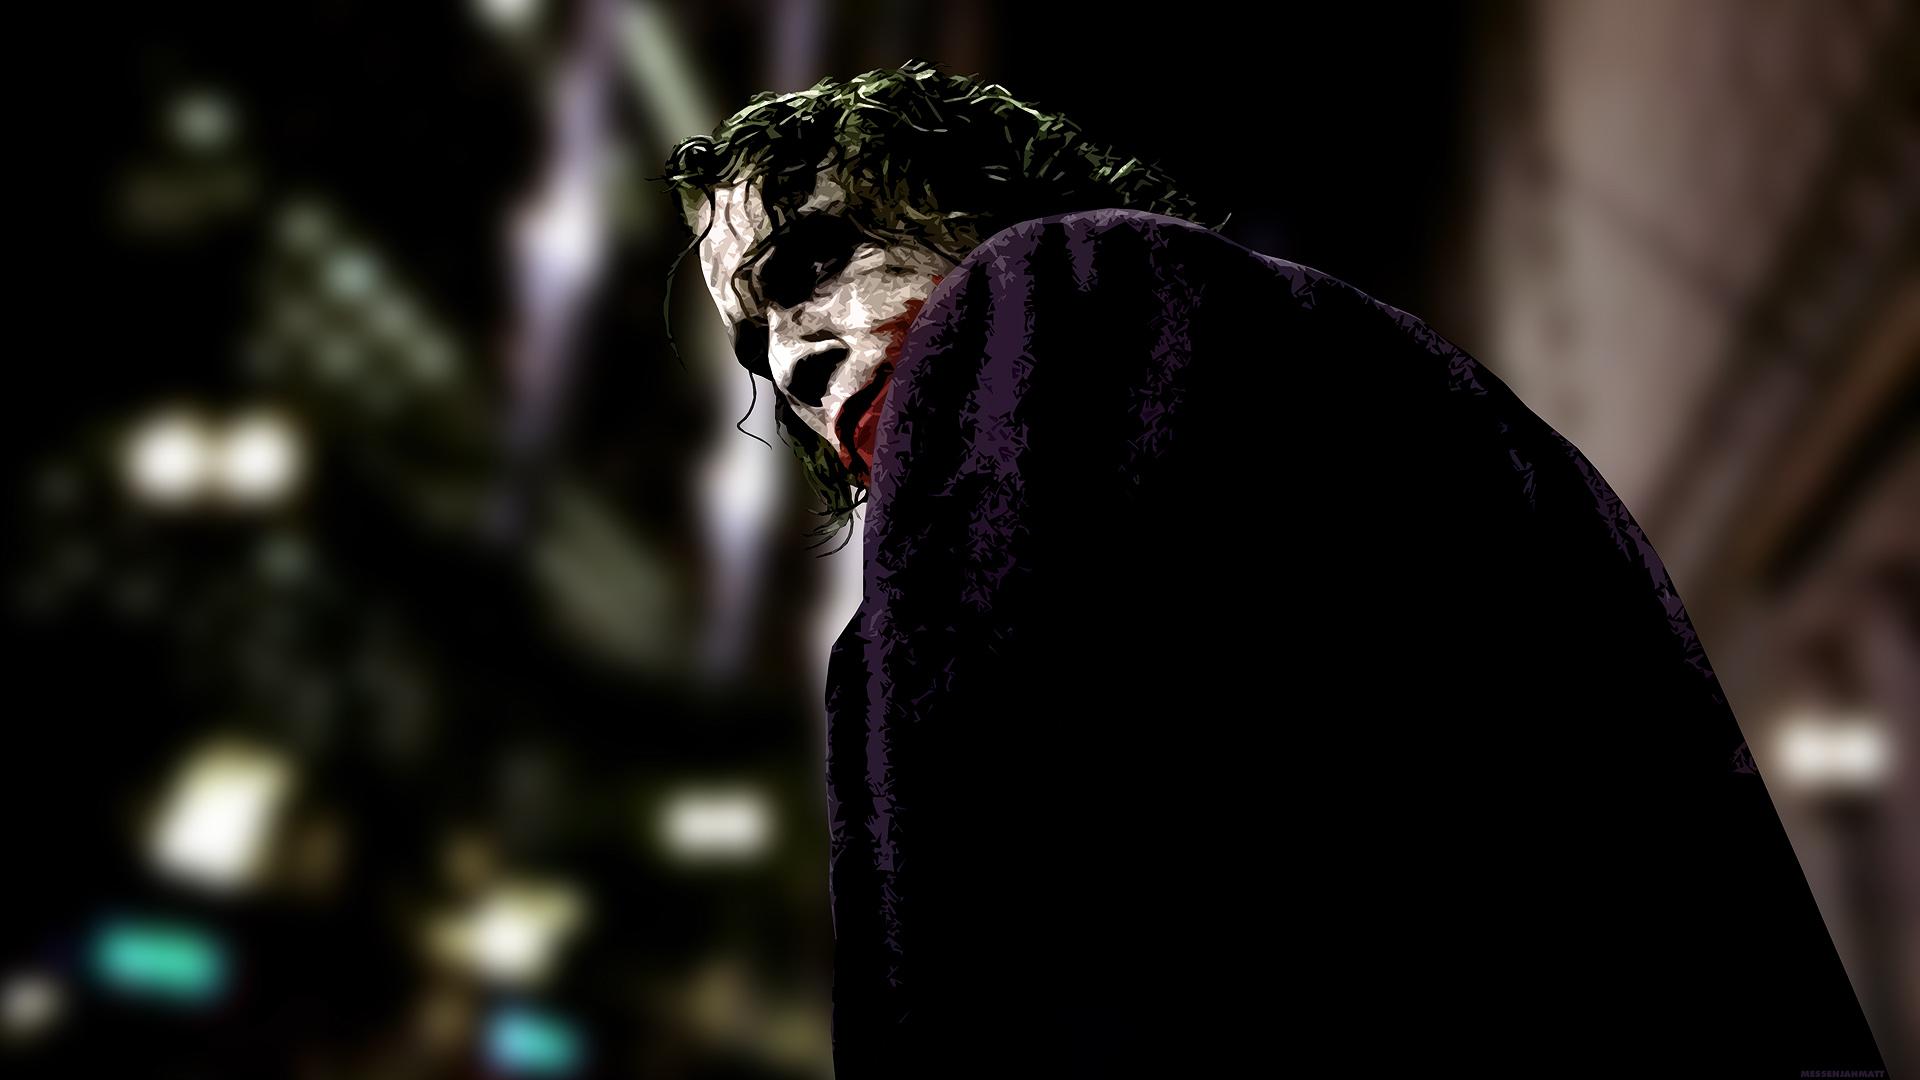 Wallpapers Hd Joker Batman Hd Wallpaper Fond D Ecran Joker Batman Hd ...